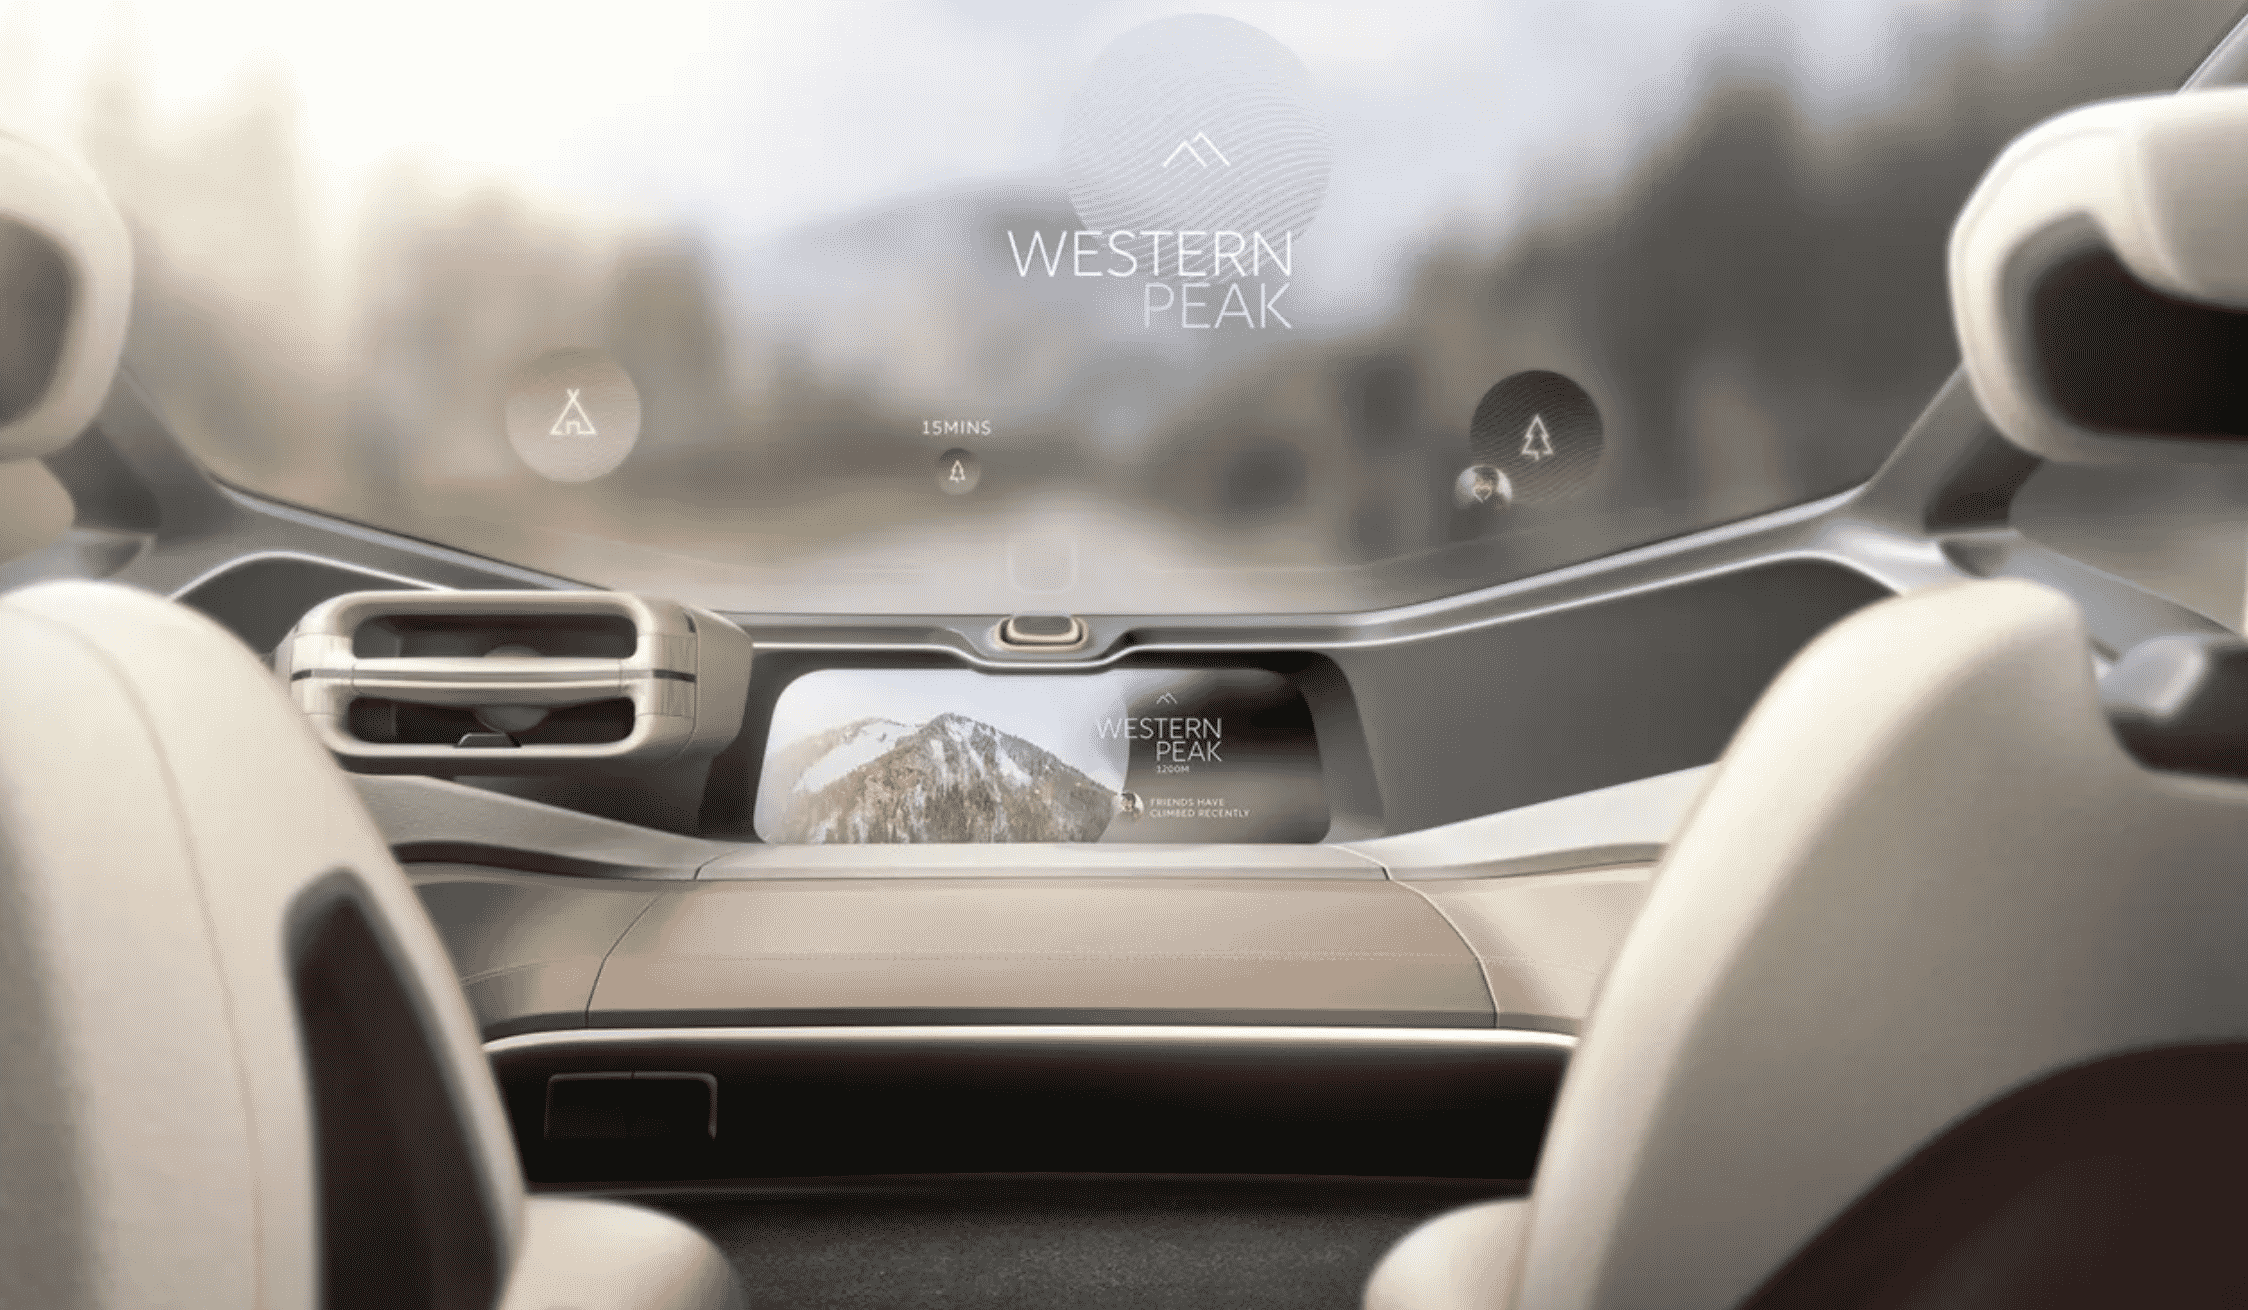 Apple's Self-Driving Vehicles